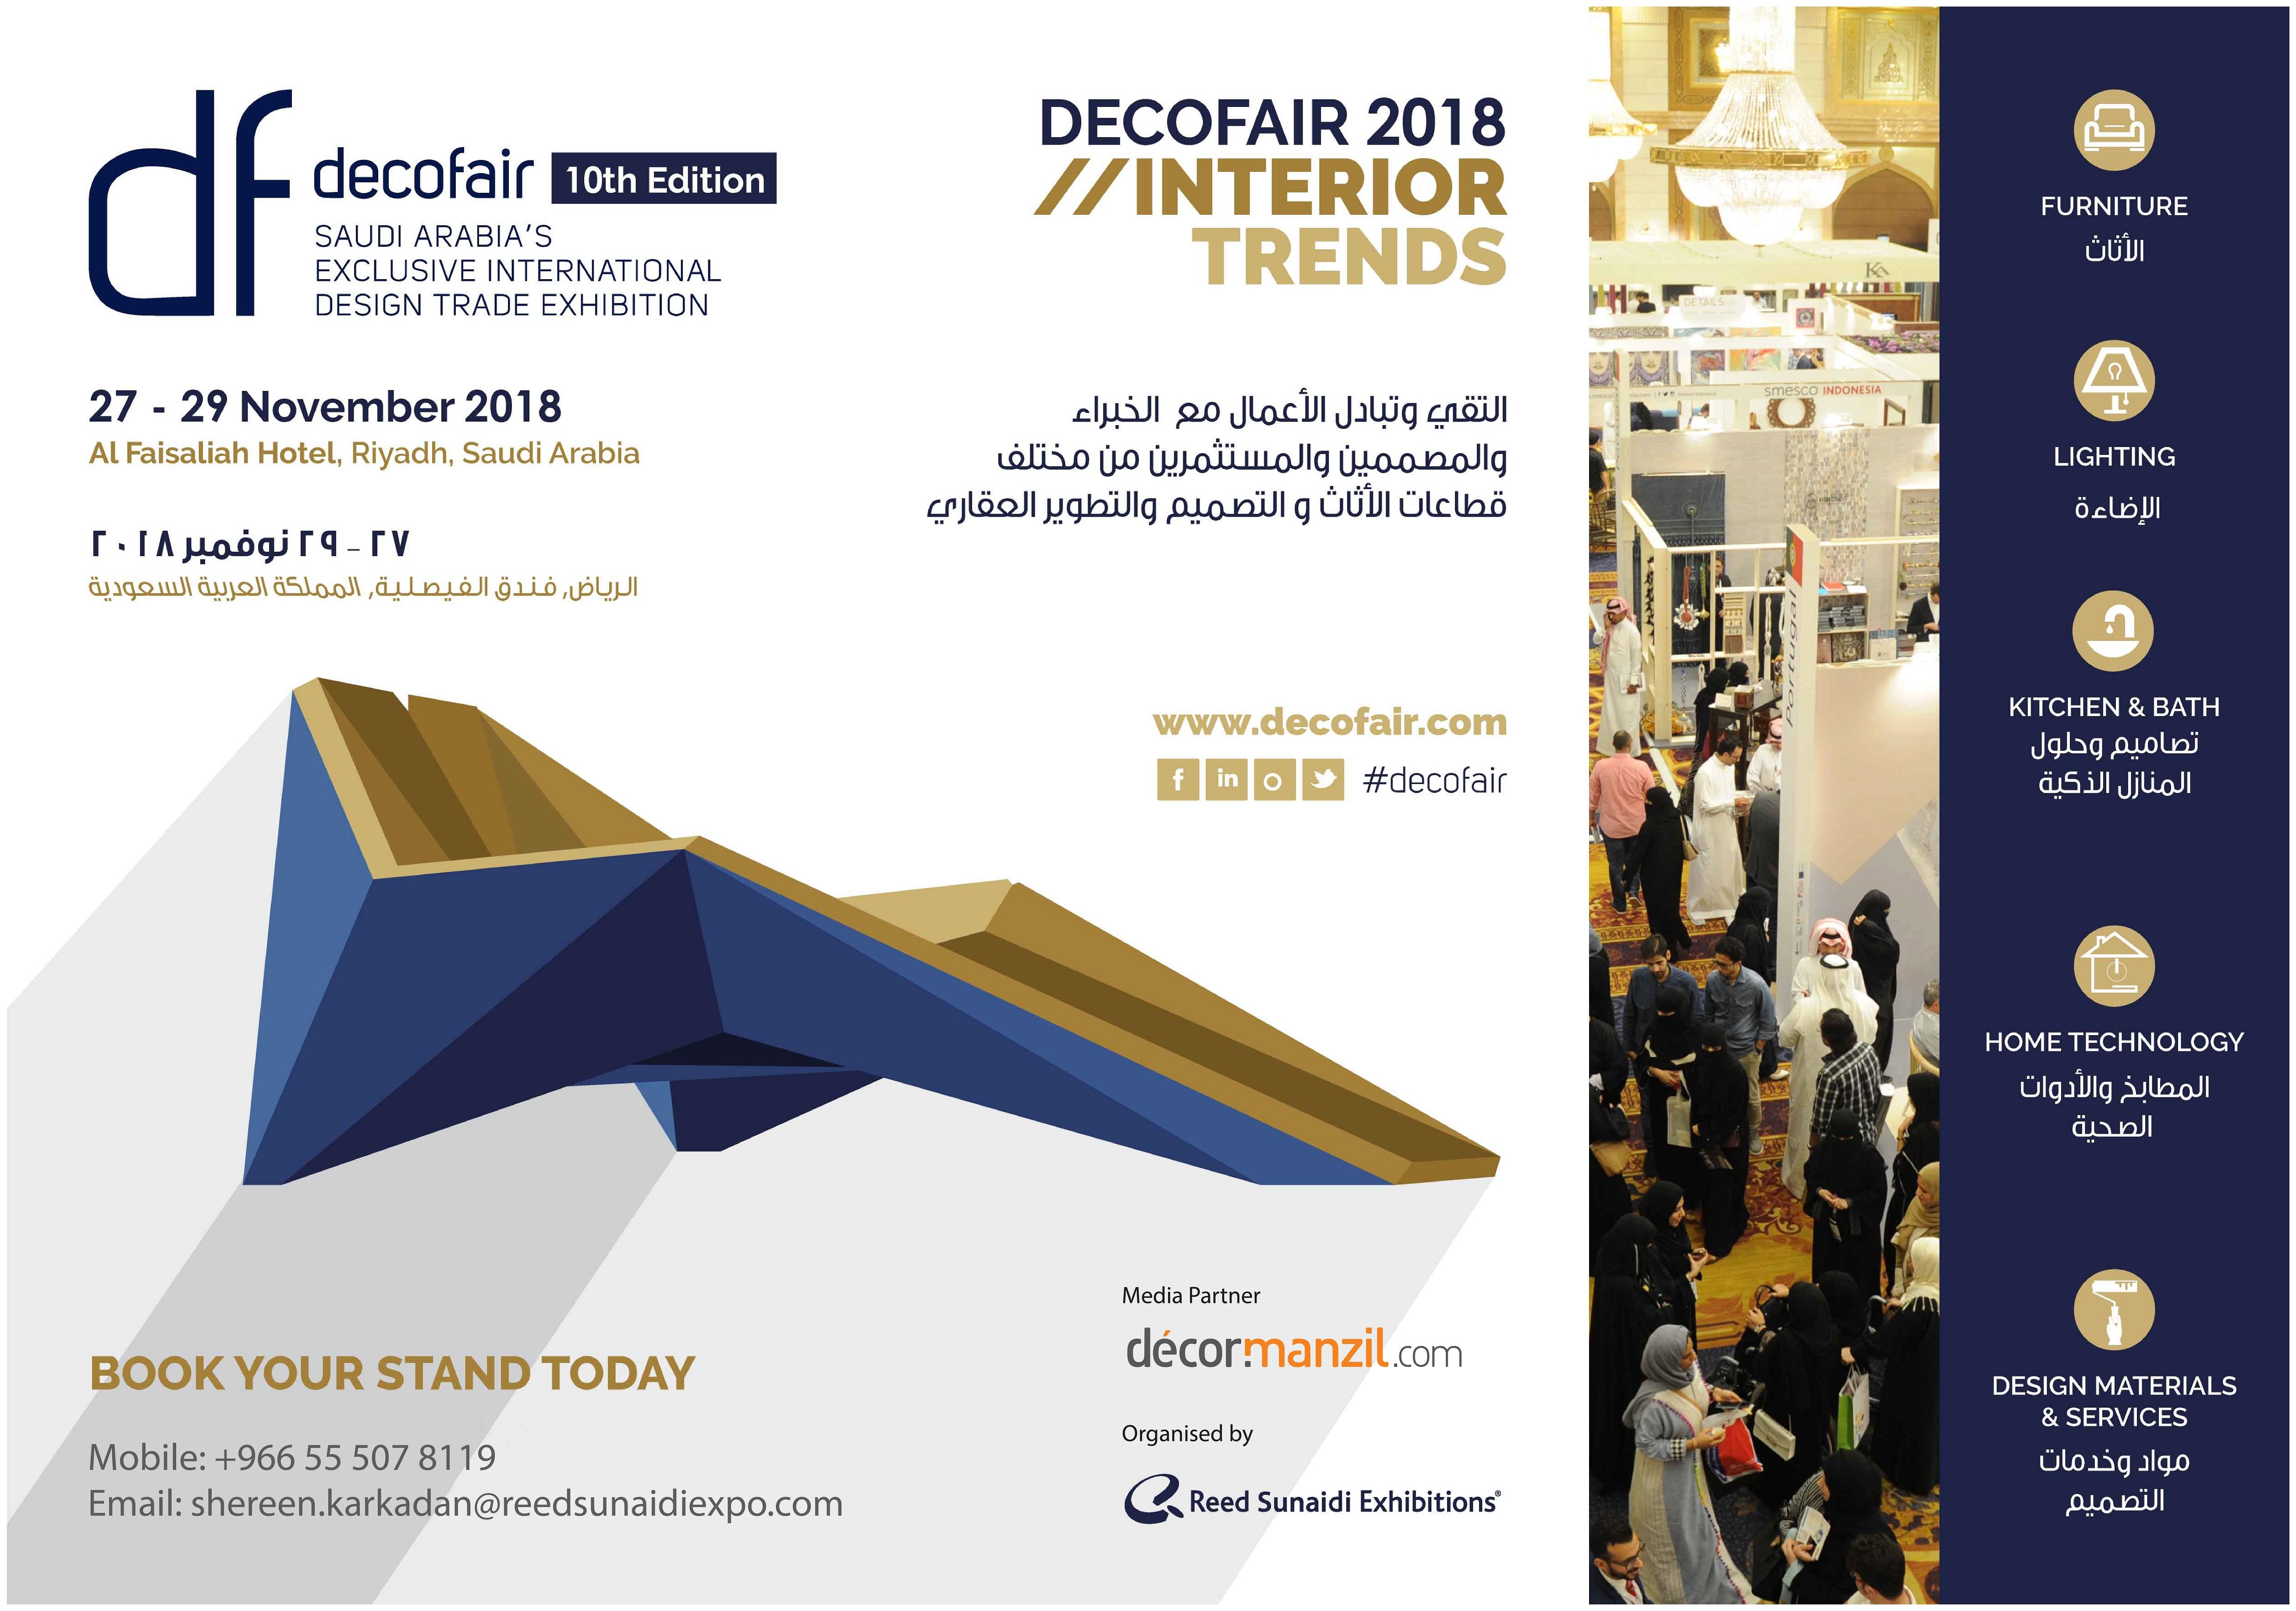 DecoFair 2018 \